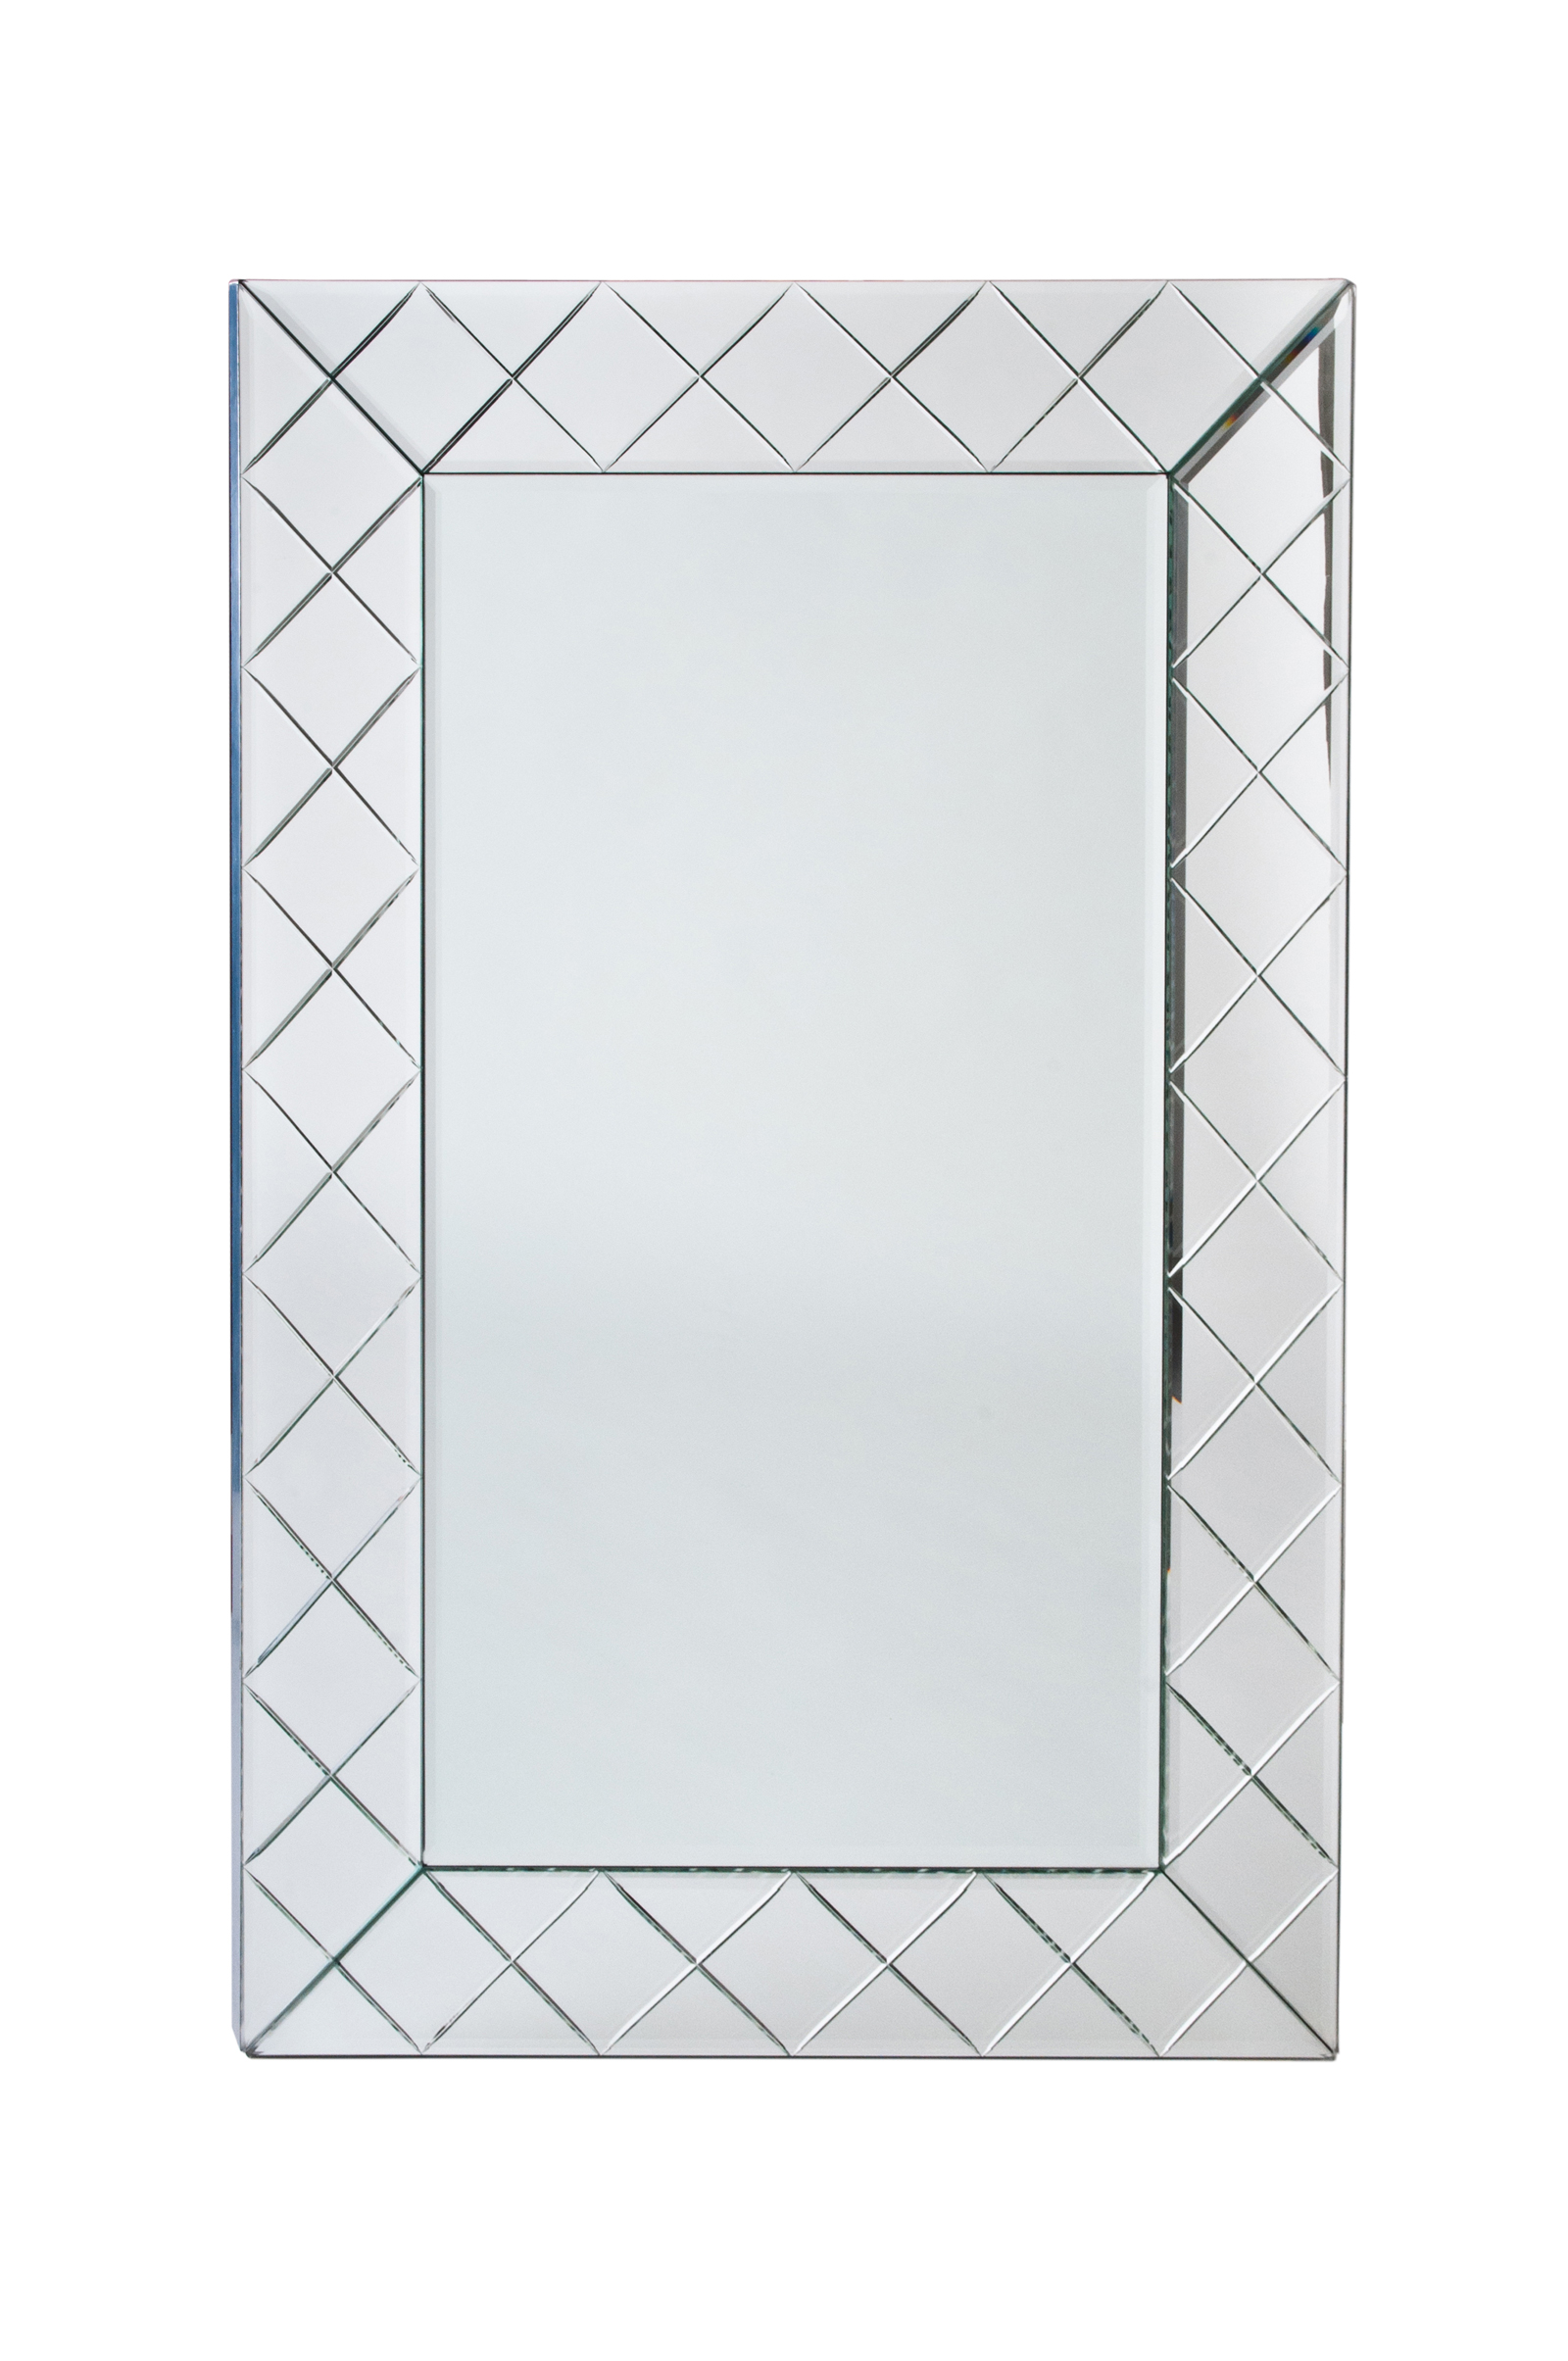 Illusion-miroir-mirror-veronese-11.jpg